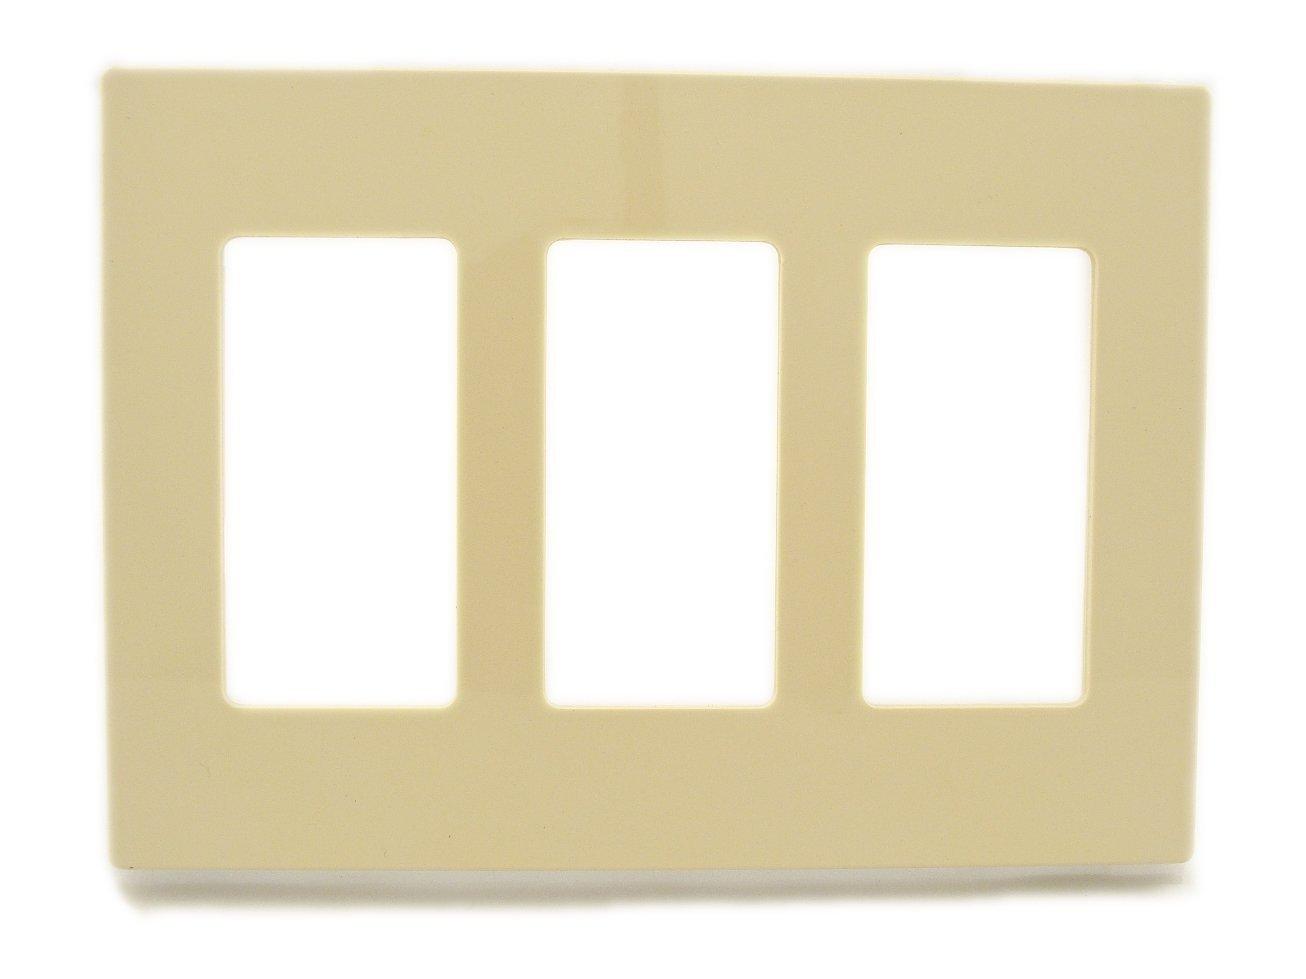 decora wall plates single leviton 80311si ivory screwless snapon polycarbonate three gang decora wall plate